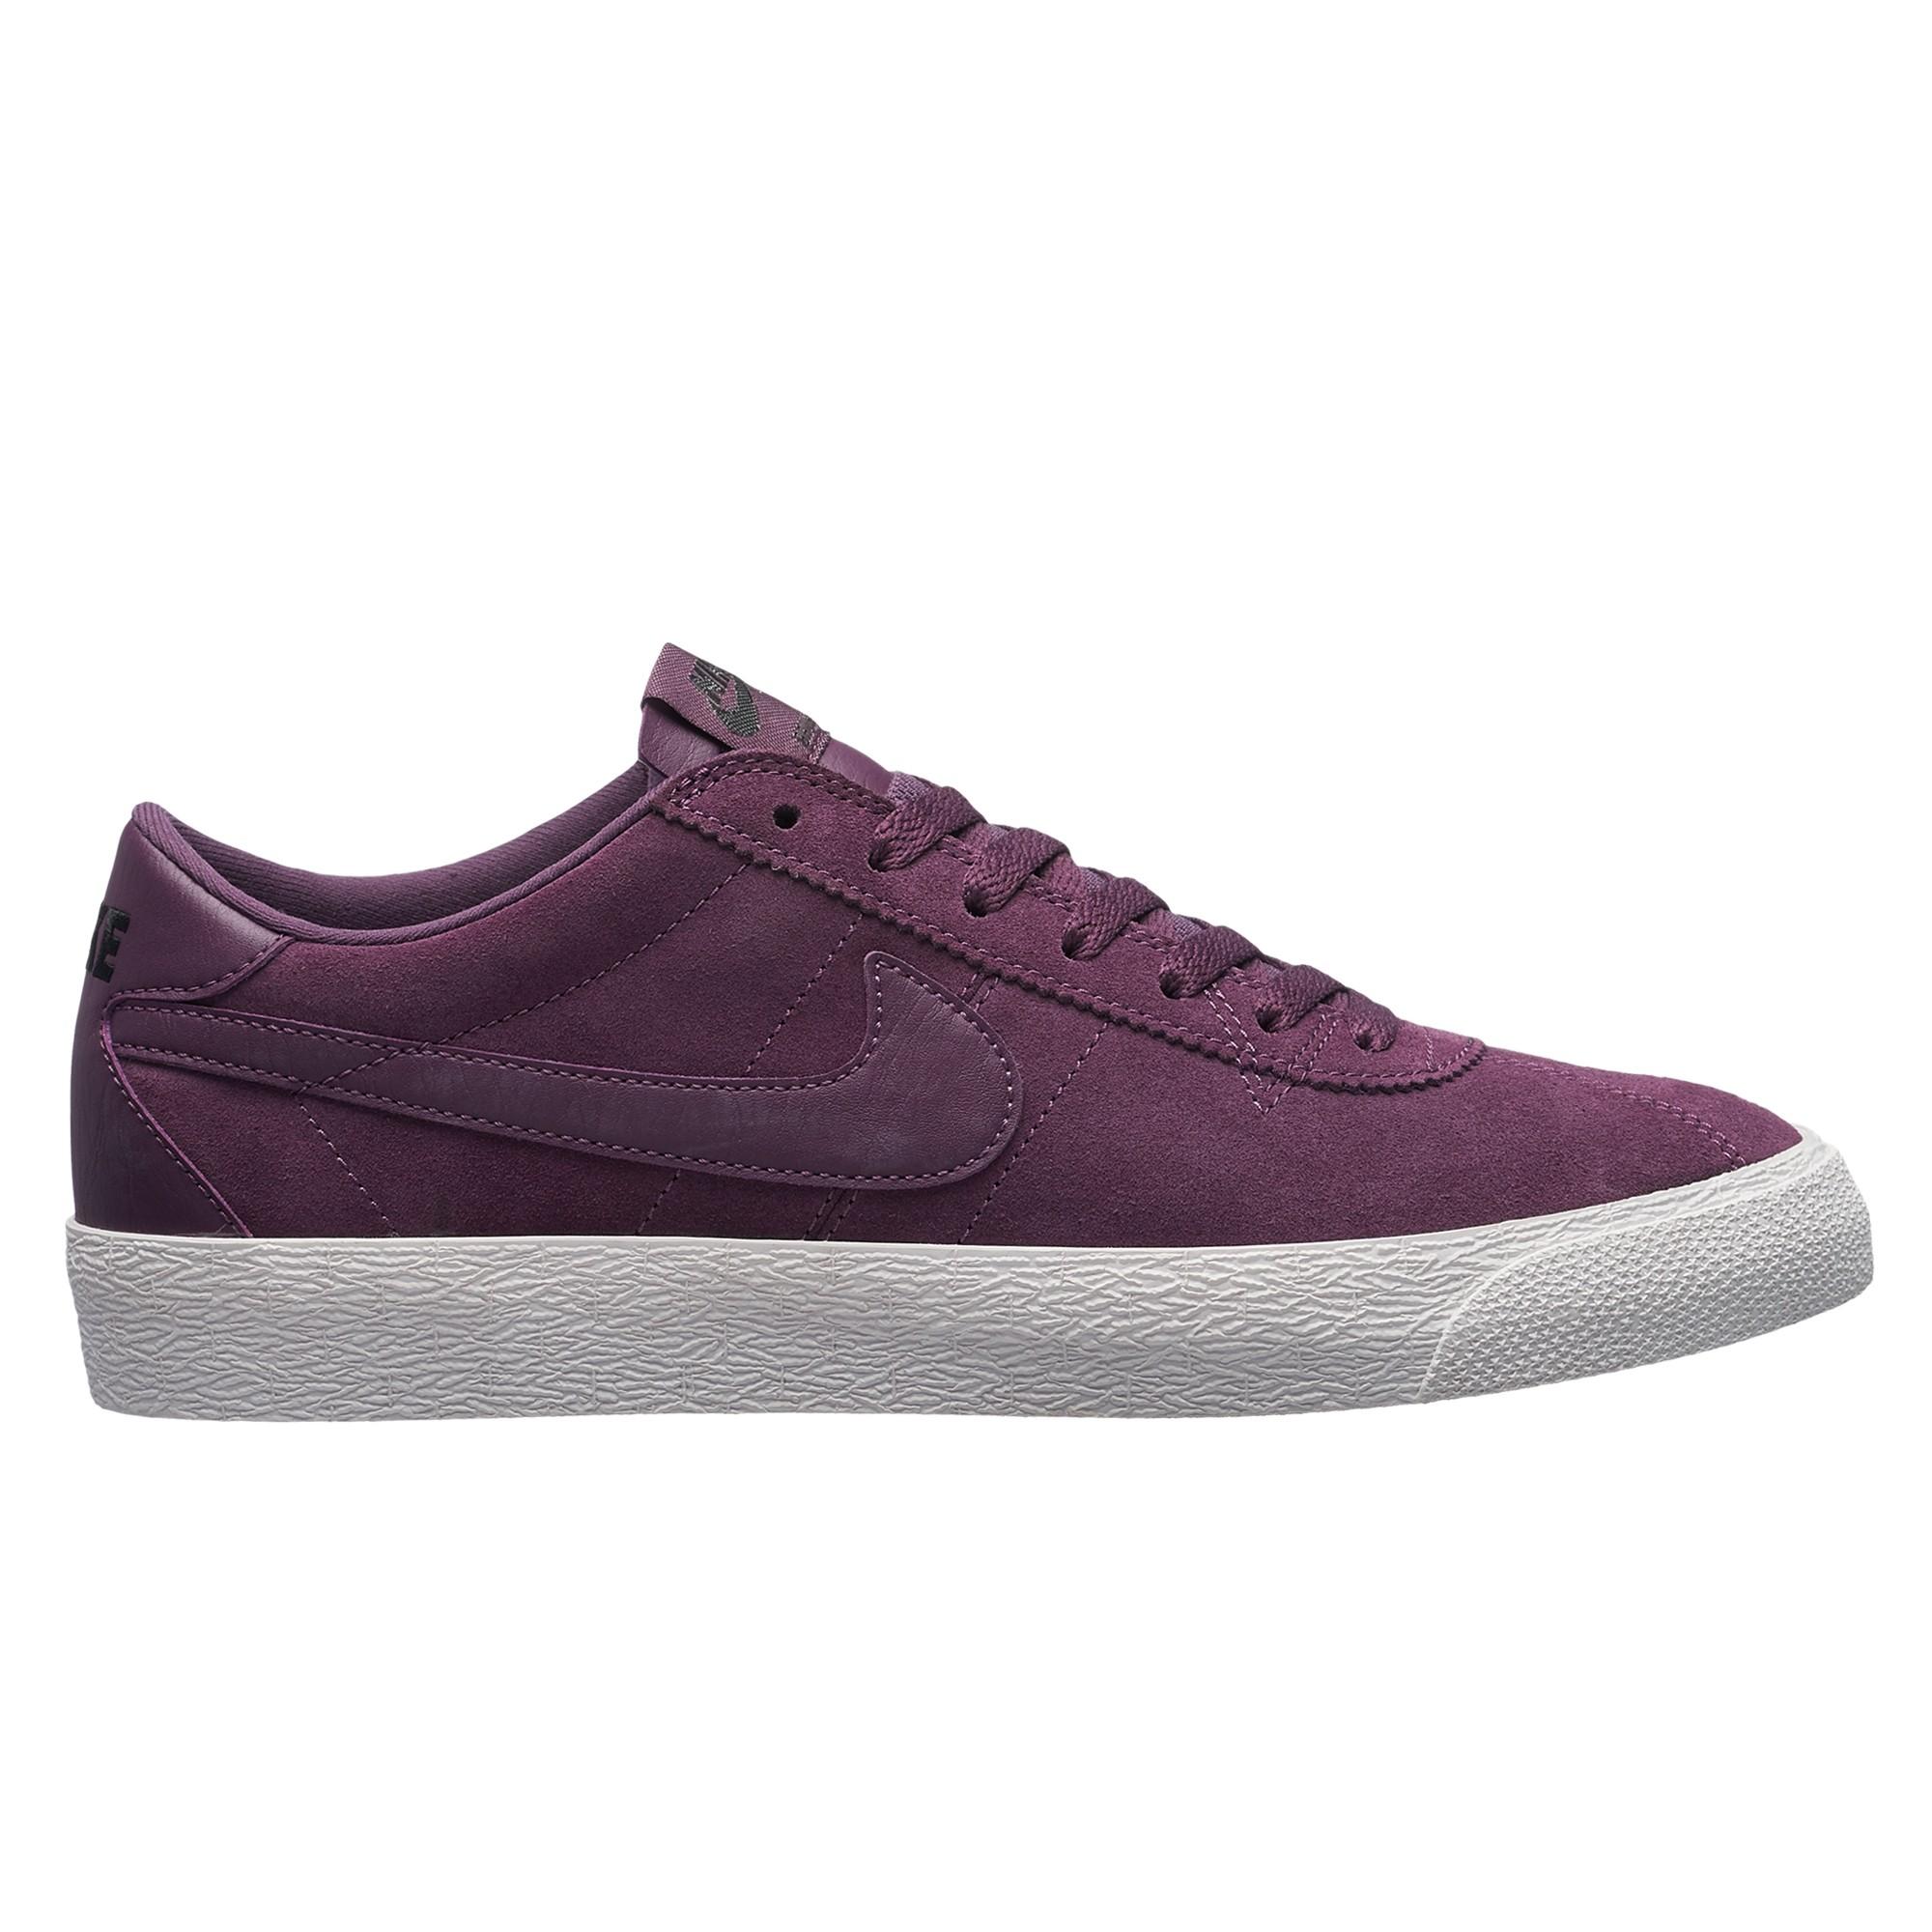 24b2dac604de Nike SB Zoom Bruin Premium SE (Pro Purple Pro Purple-White ...